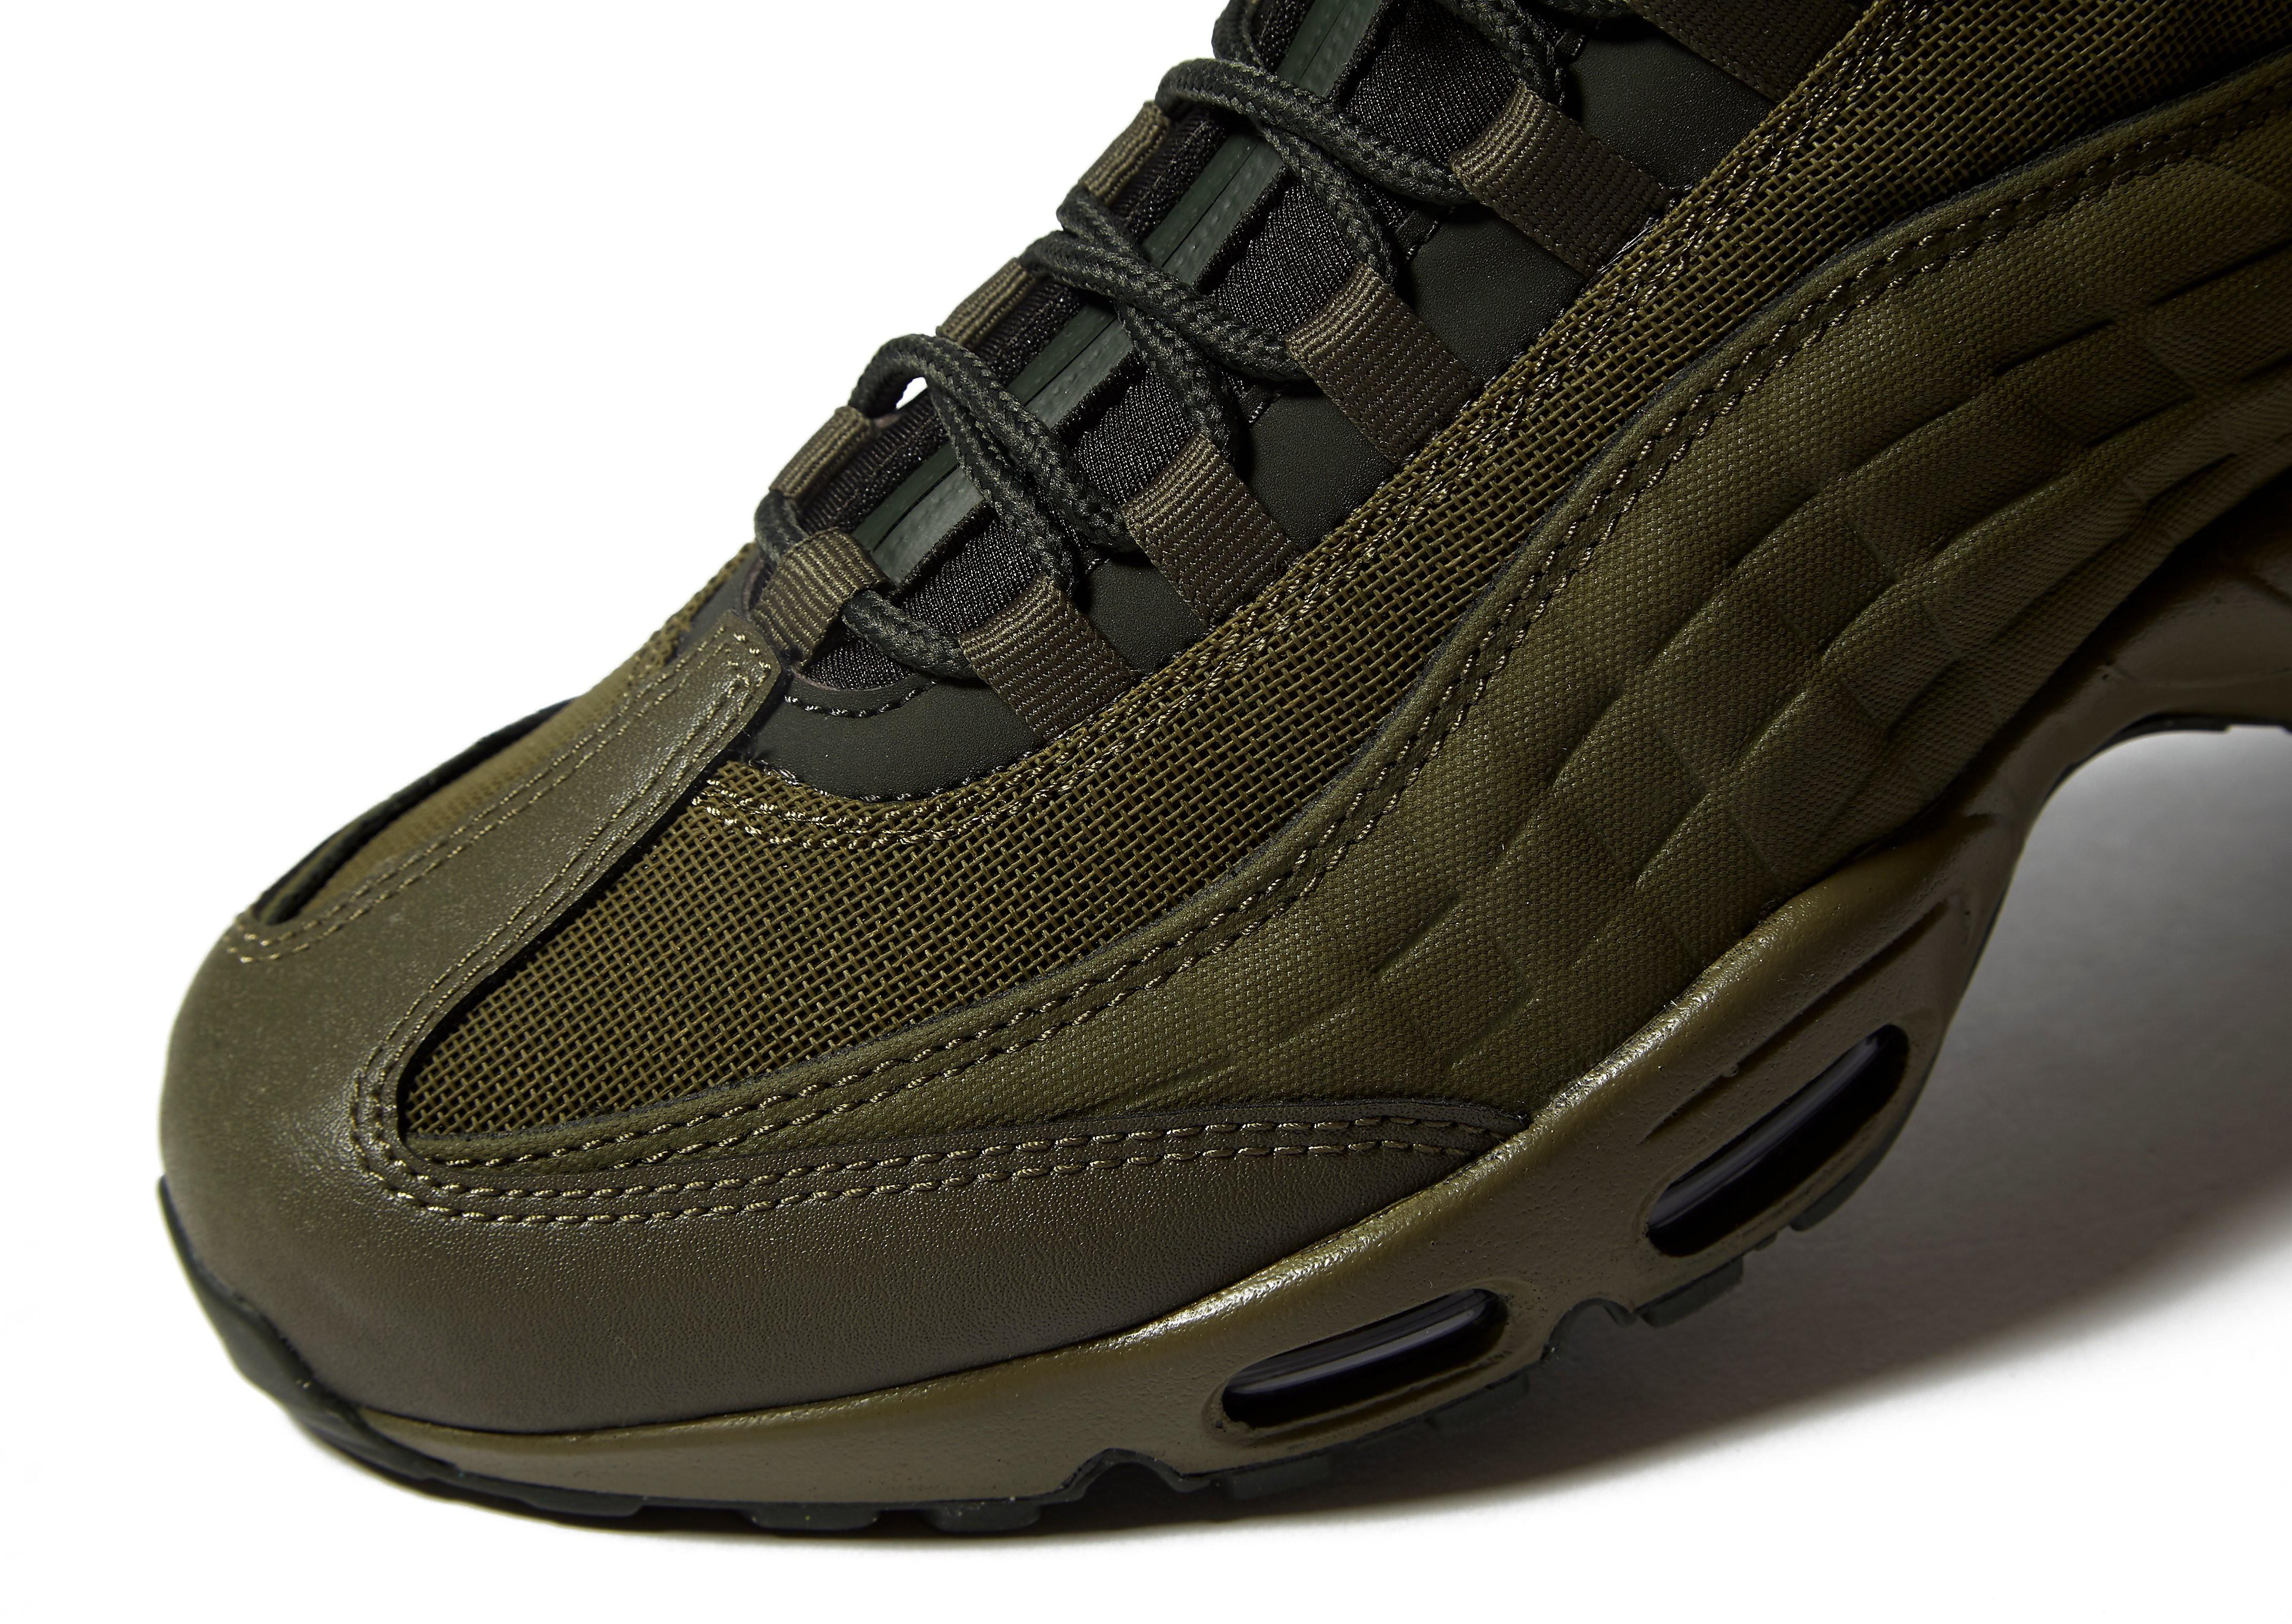 Nike Max 95 Sneakerboot